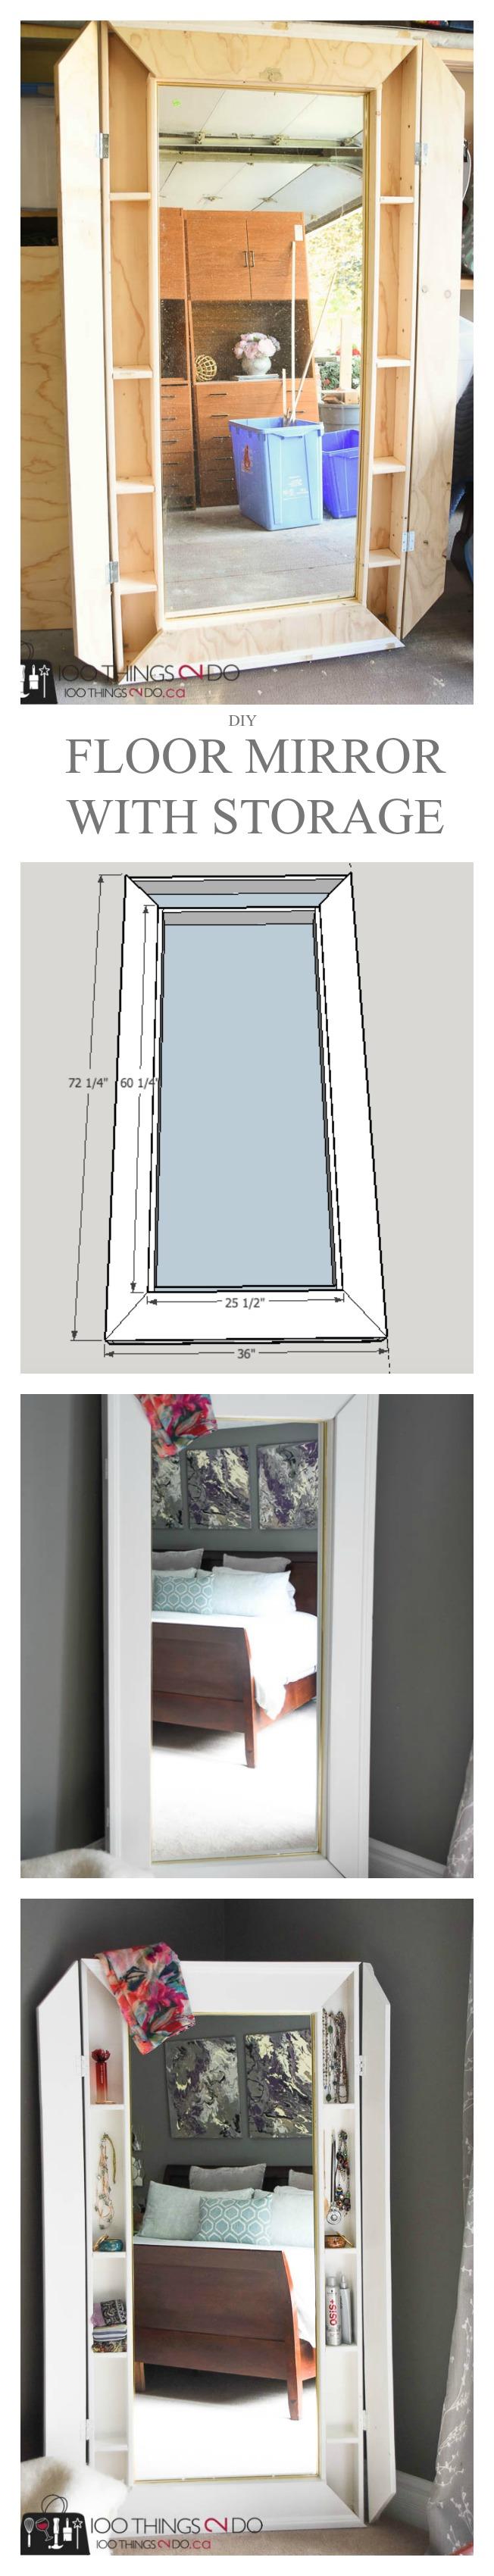 DIY Floor Mirror, Floor Mirror With Storage, Mirror With Storage, Mirror  With Cabinet